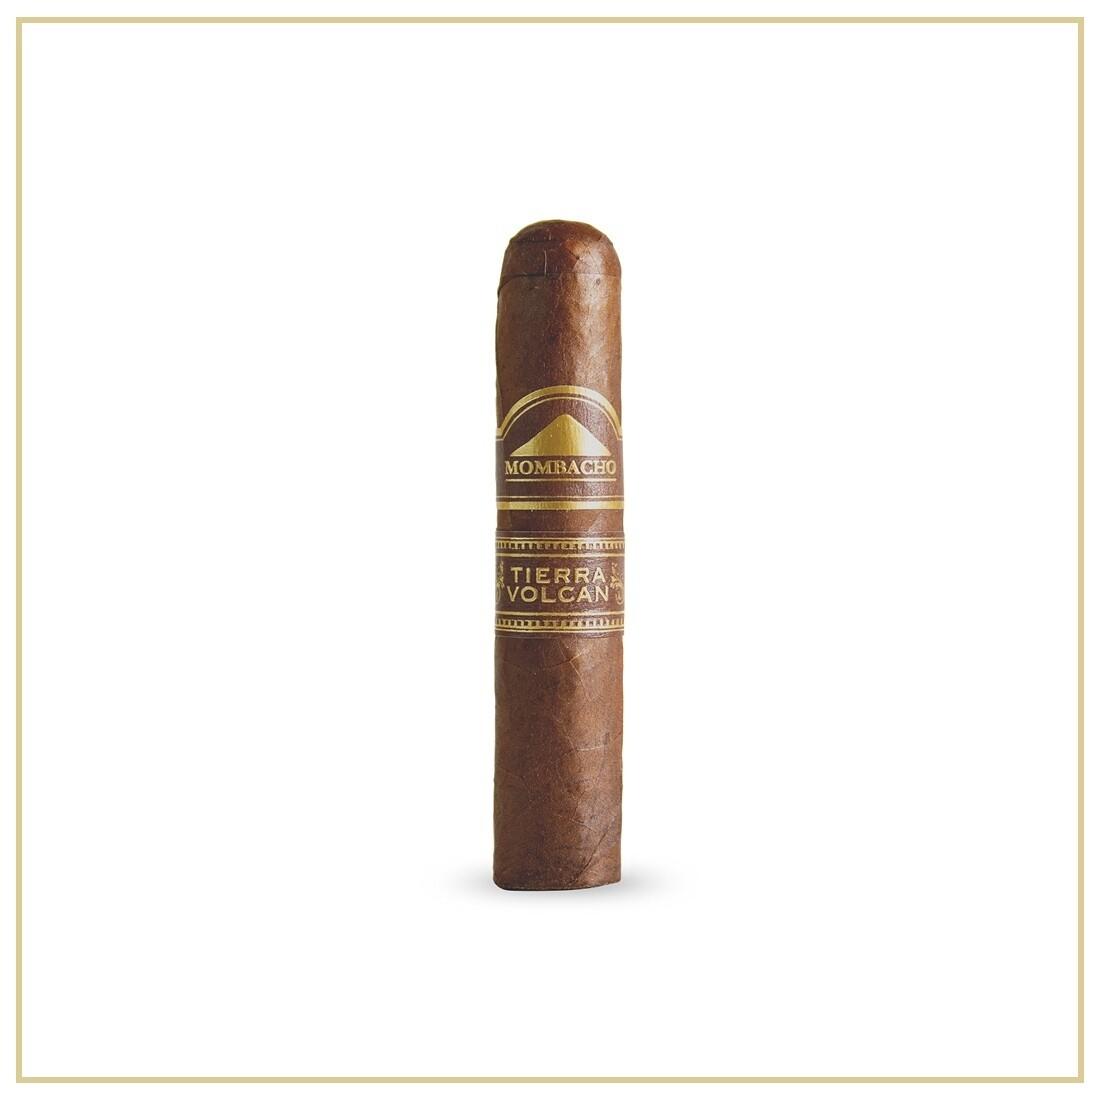 Mombacho Tierra Volcan Corto 4 x 50 Single Cigar